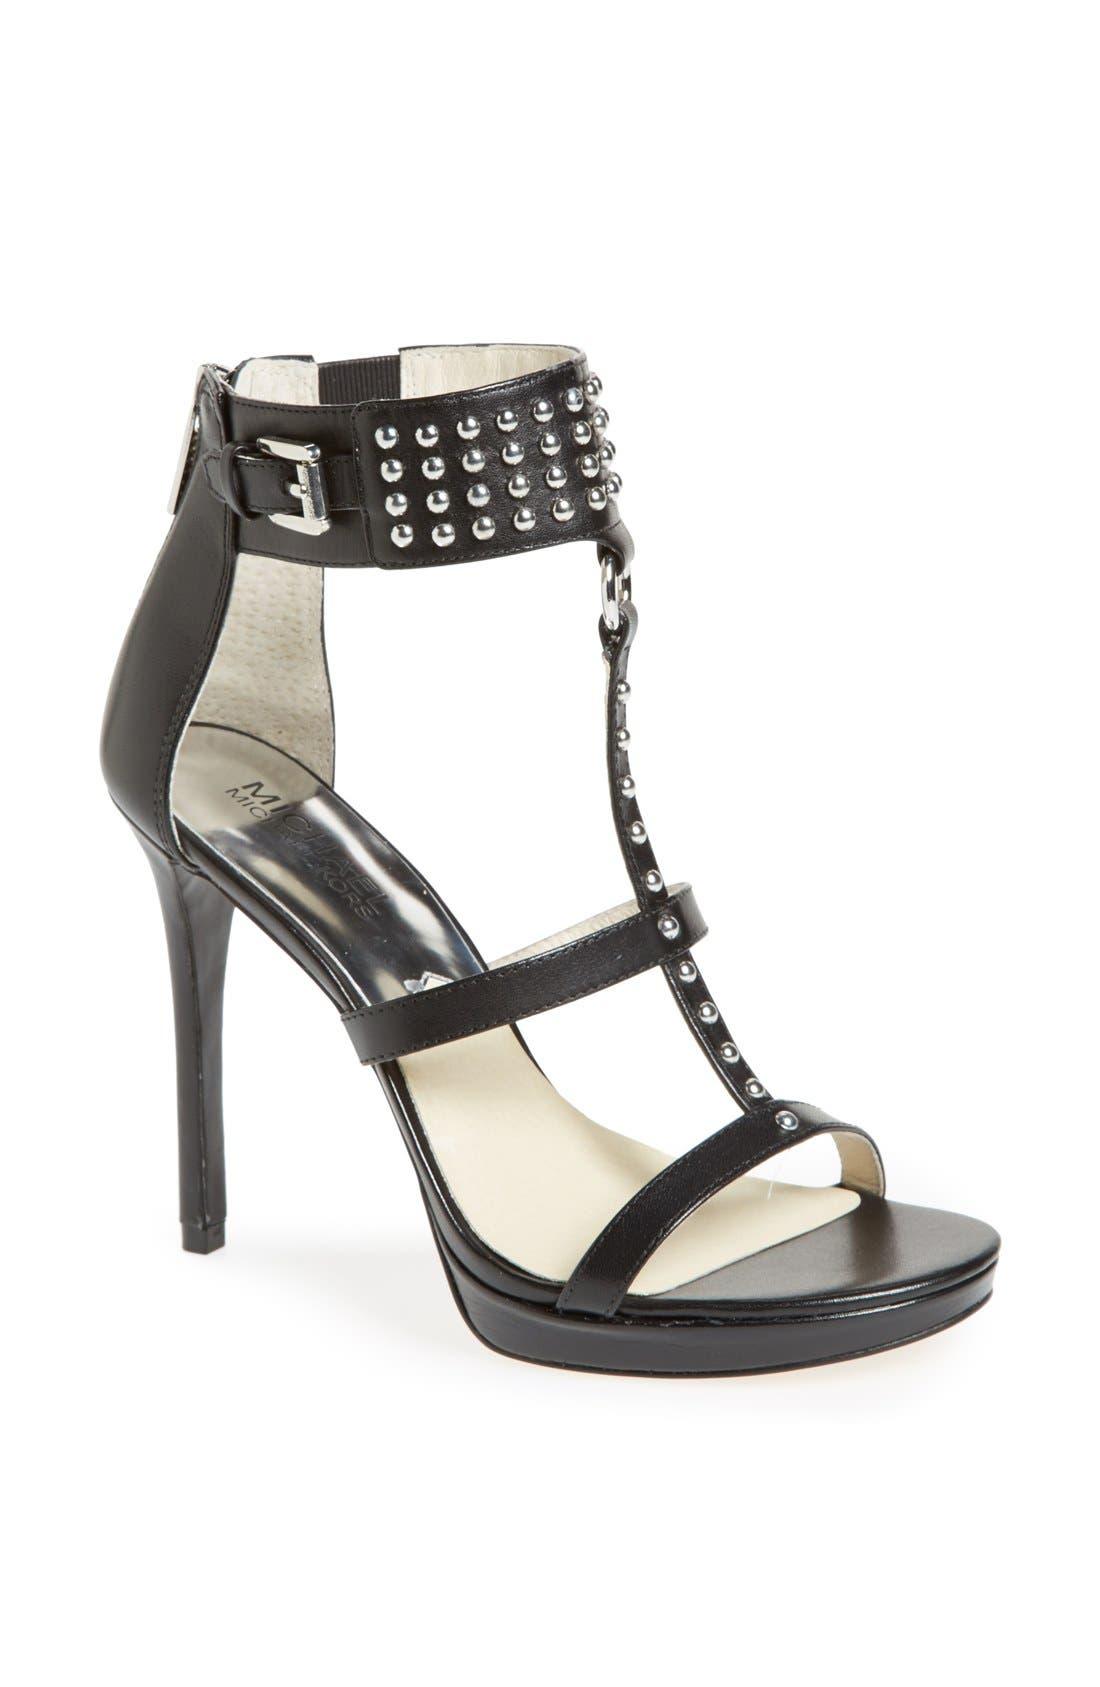 Main Image - MICHAEL Michael Kors 'Celena' Studded Leather Sandal